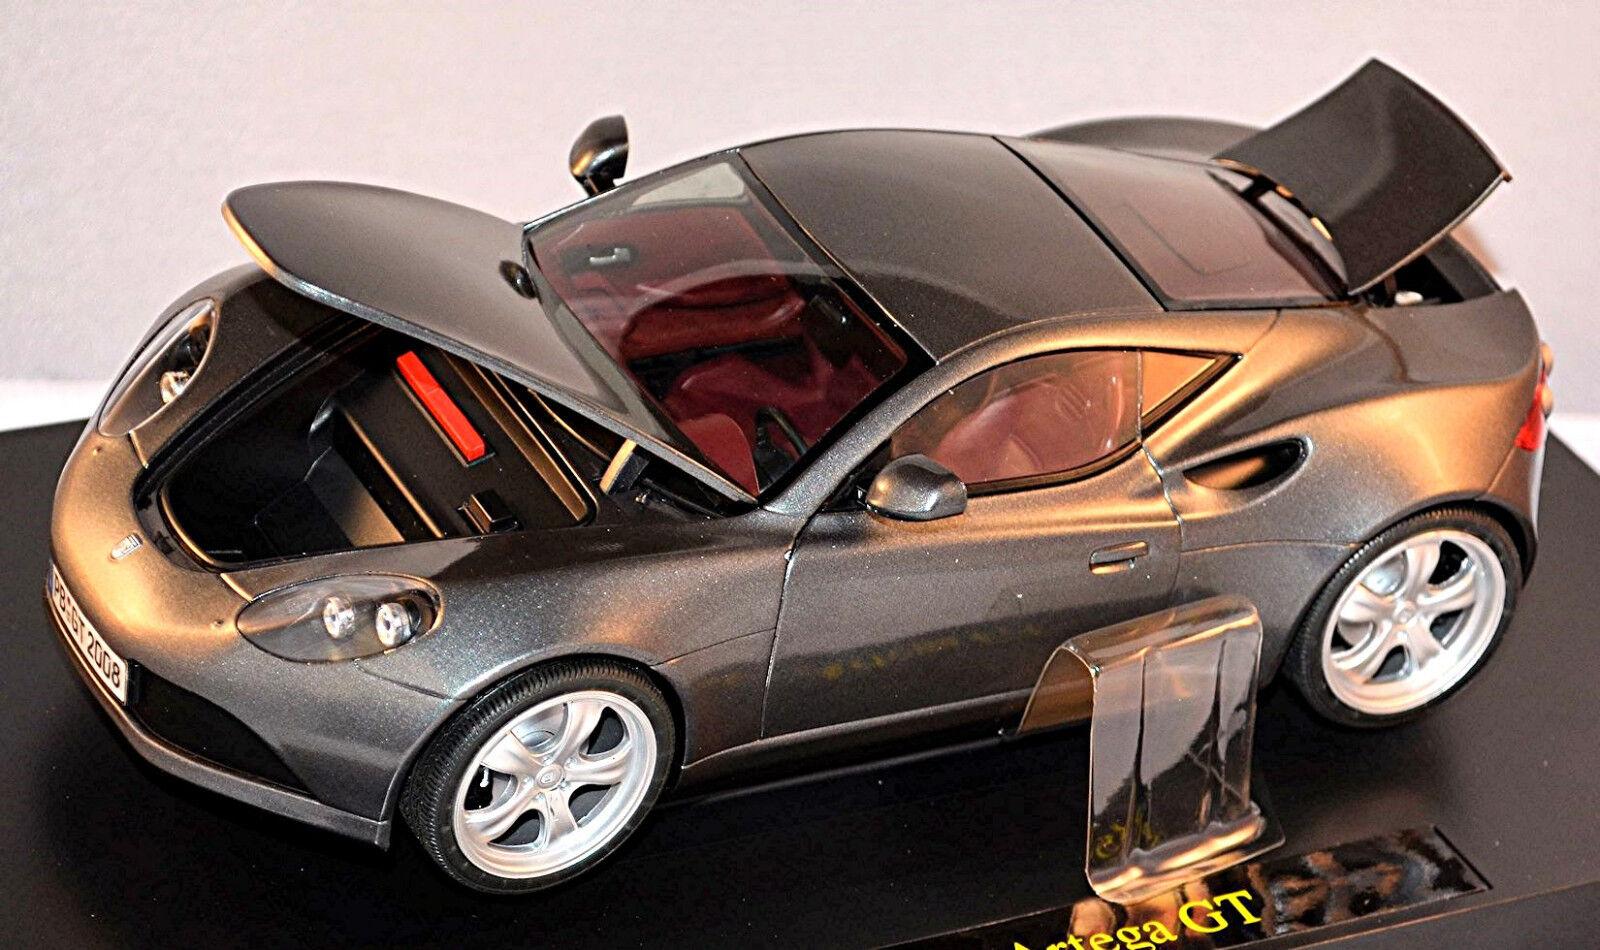 Artega GT Coupe V6 300PS VW Motor 2009-12 grey grey metallic 1 18 Revell